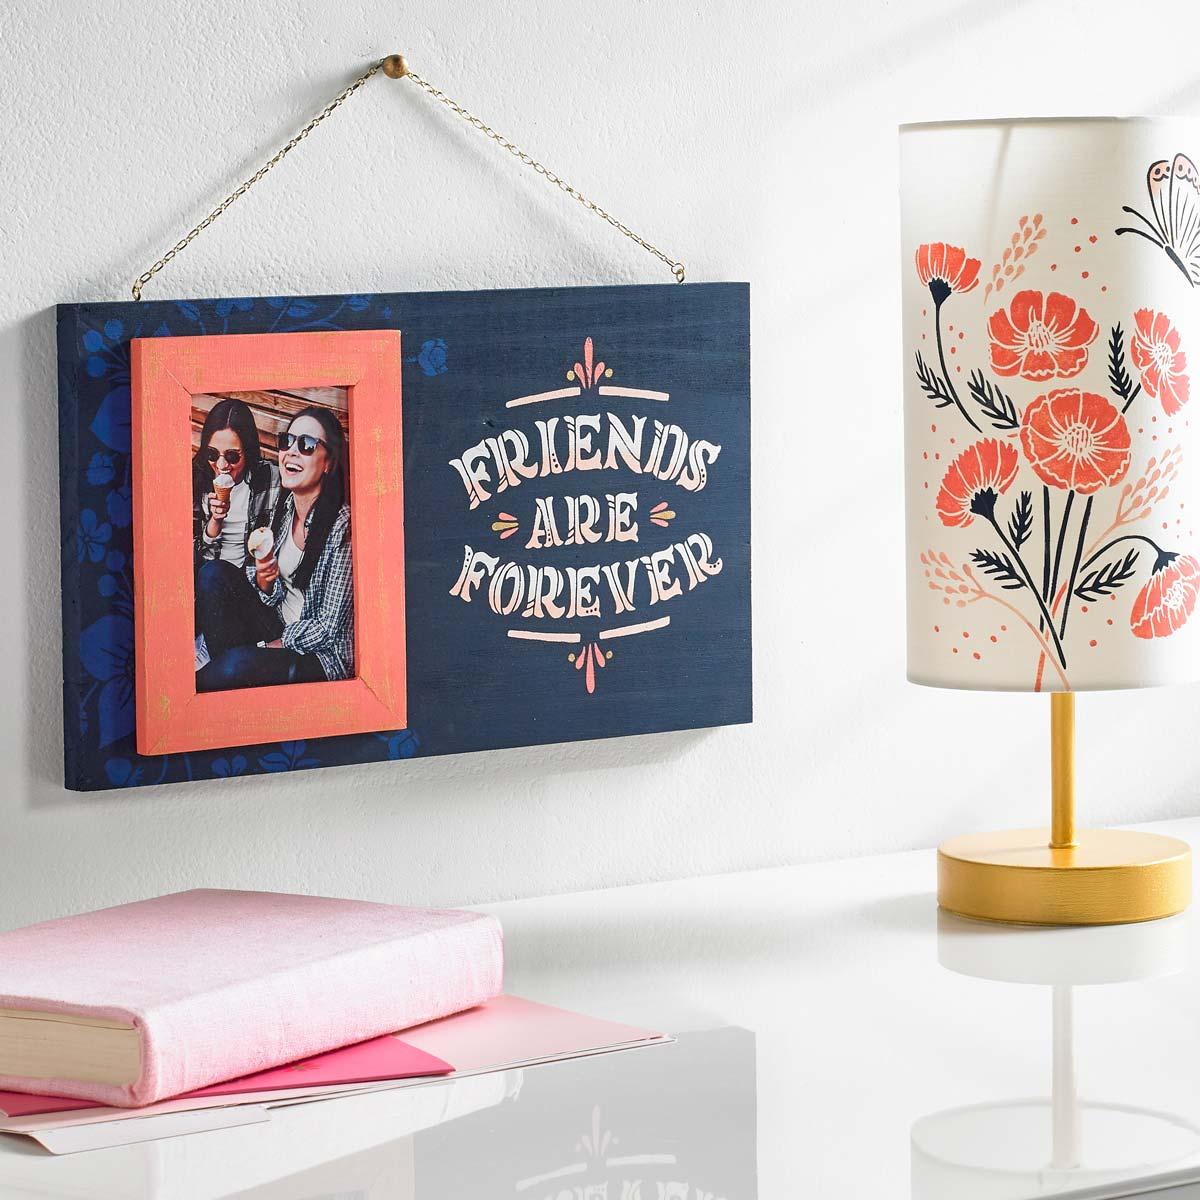 Hallmark Handcrafted Adhesive Stencils - Enchanting Design Pack, 8-1/2